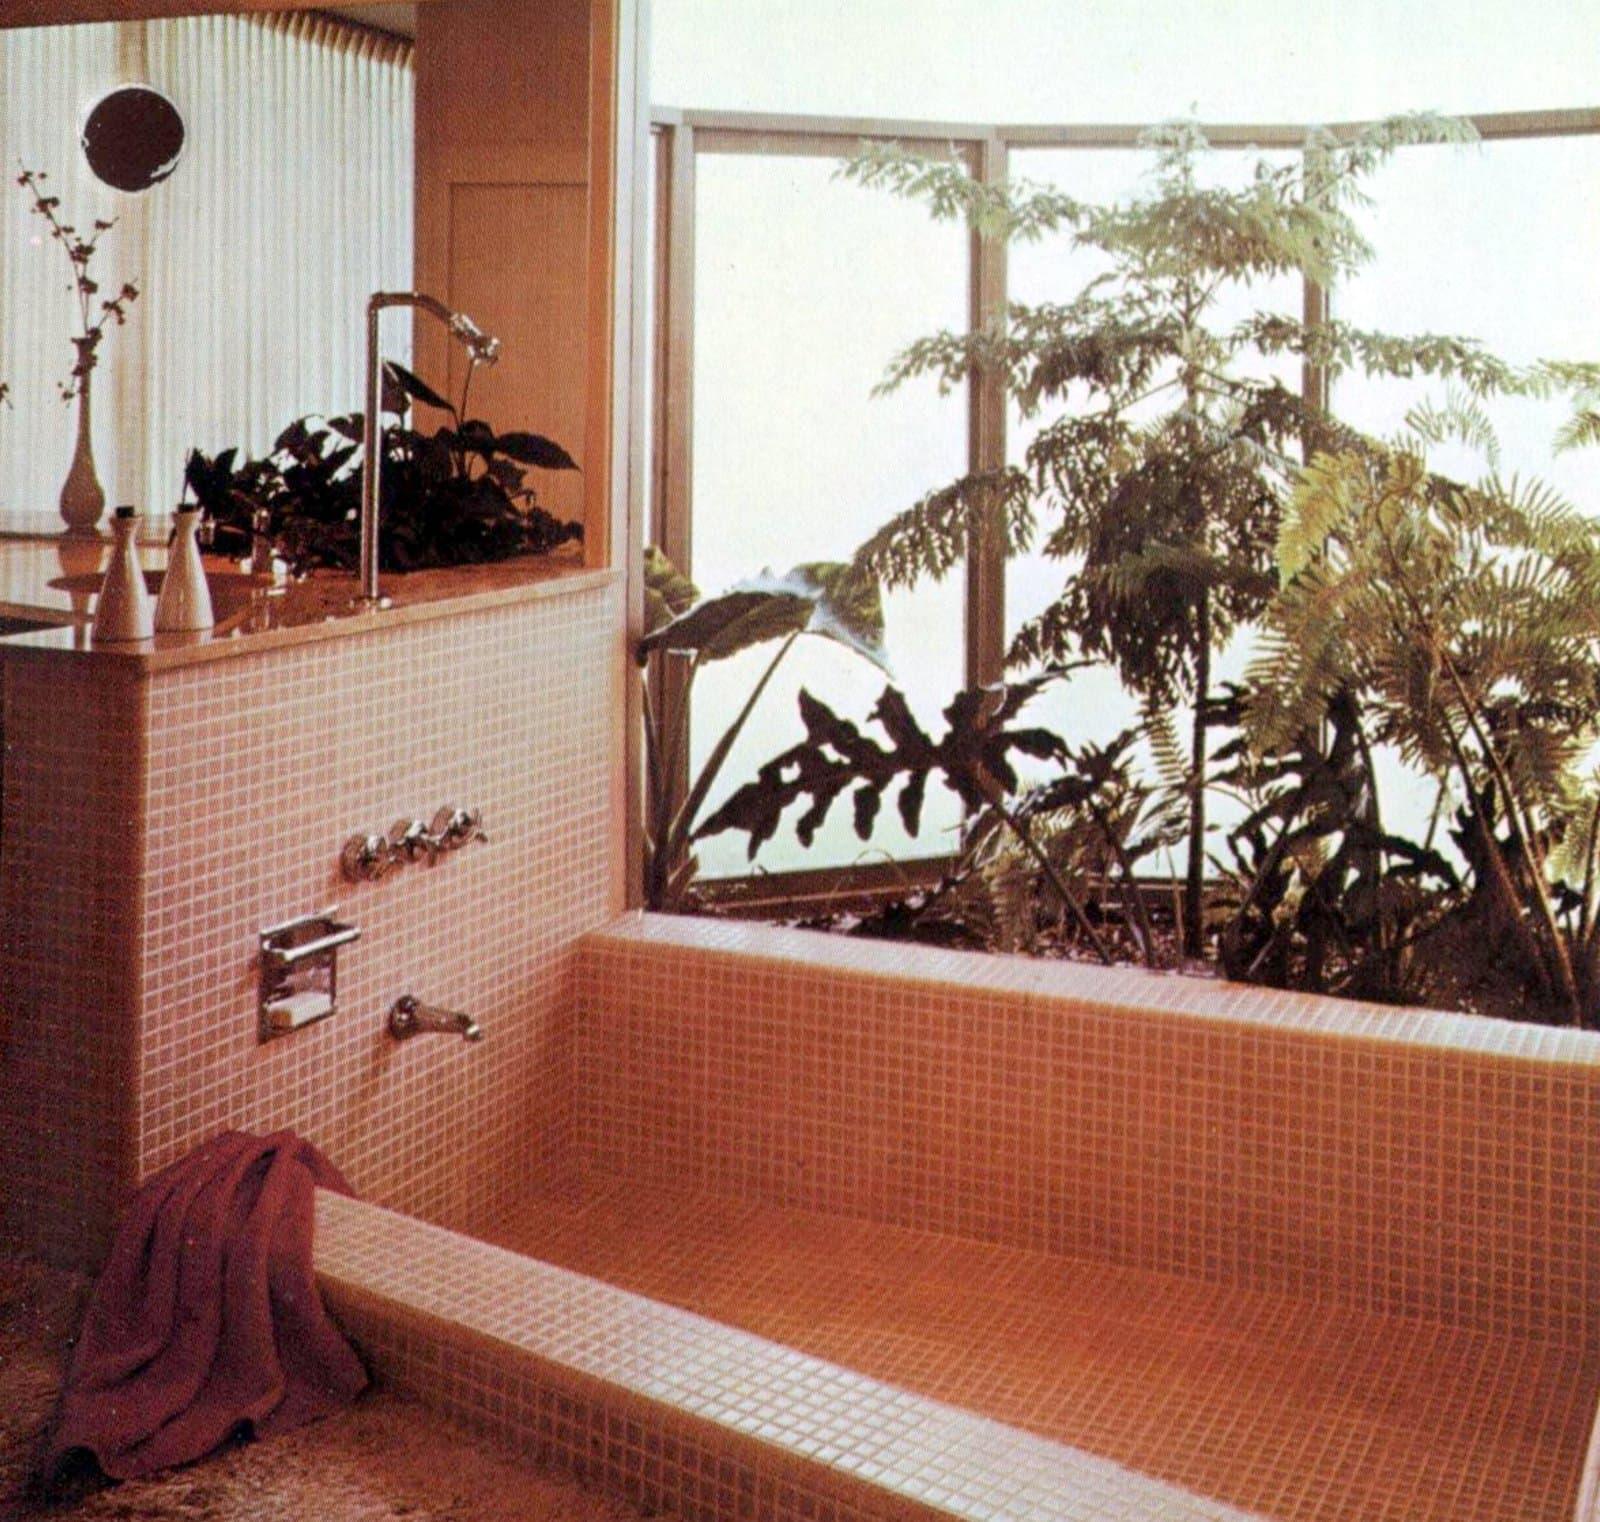 Pink mosaic vintage bathroom tile design ideas